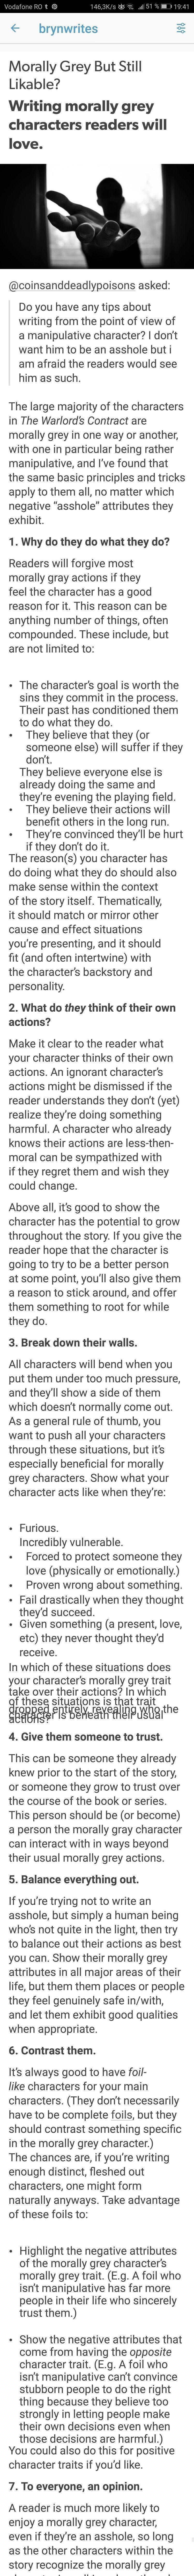 Writing morally gray characters